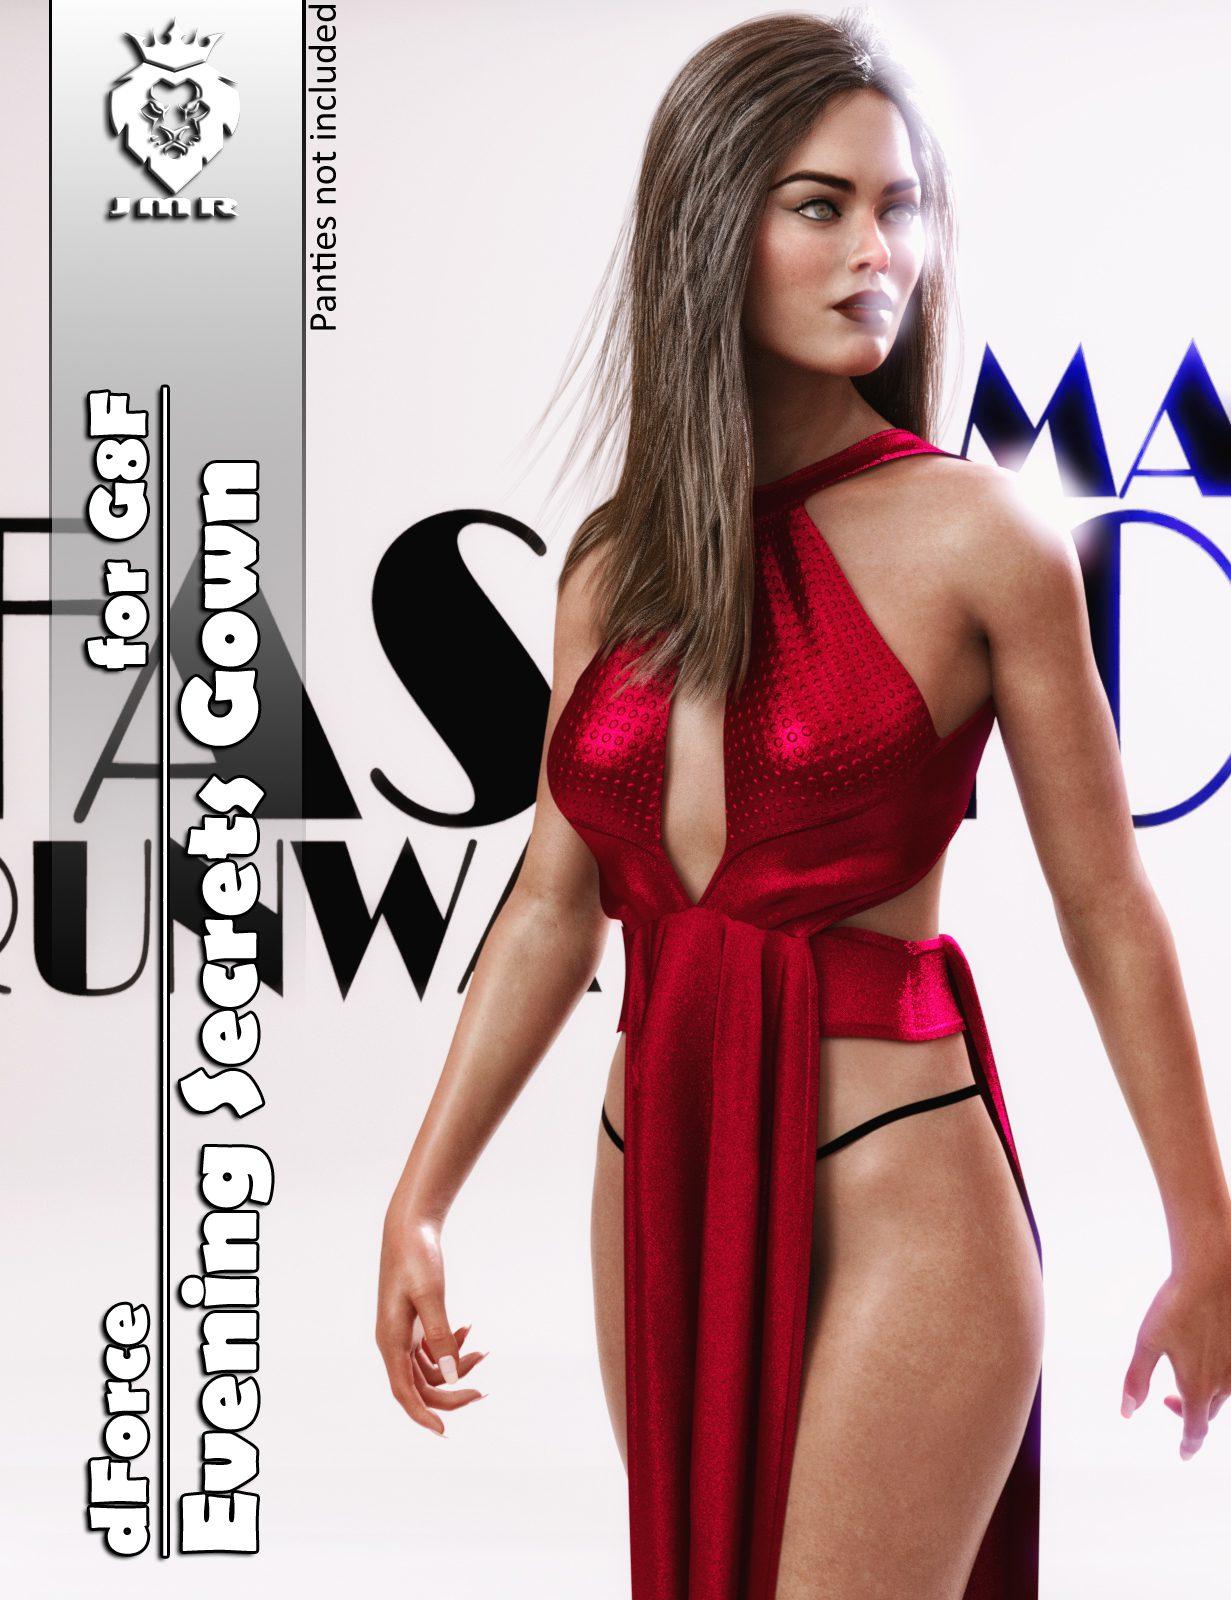 JMR dForce Evening Secrets Gown for G8F_DAZ3D下载站